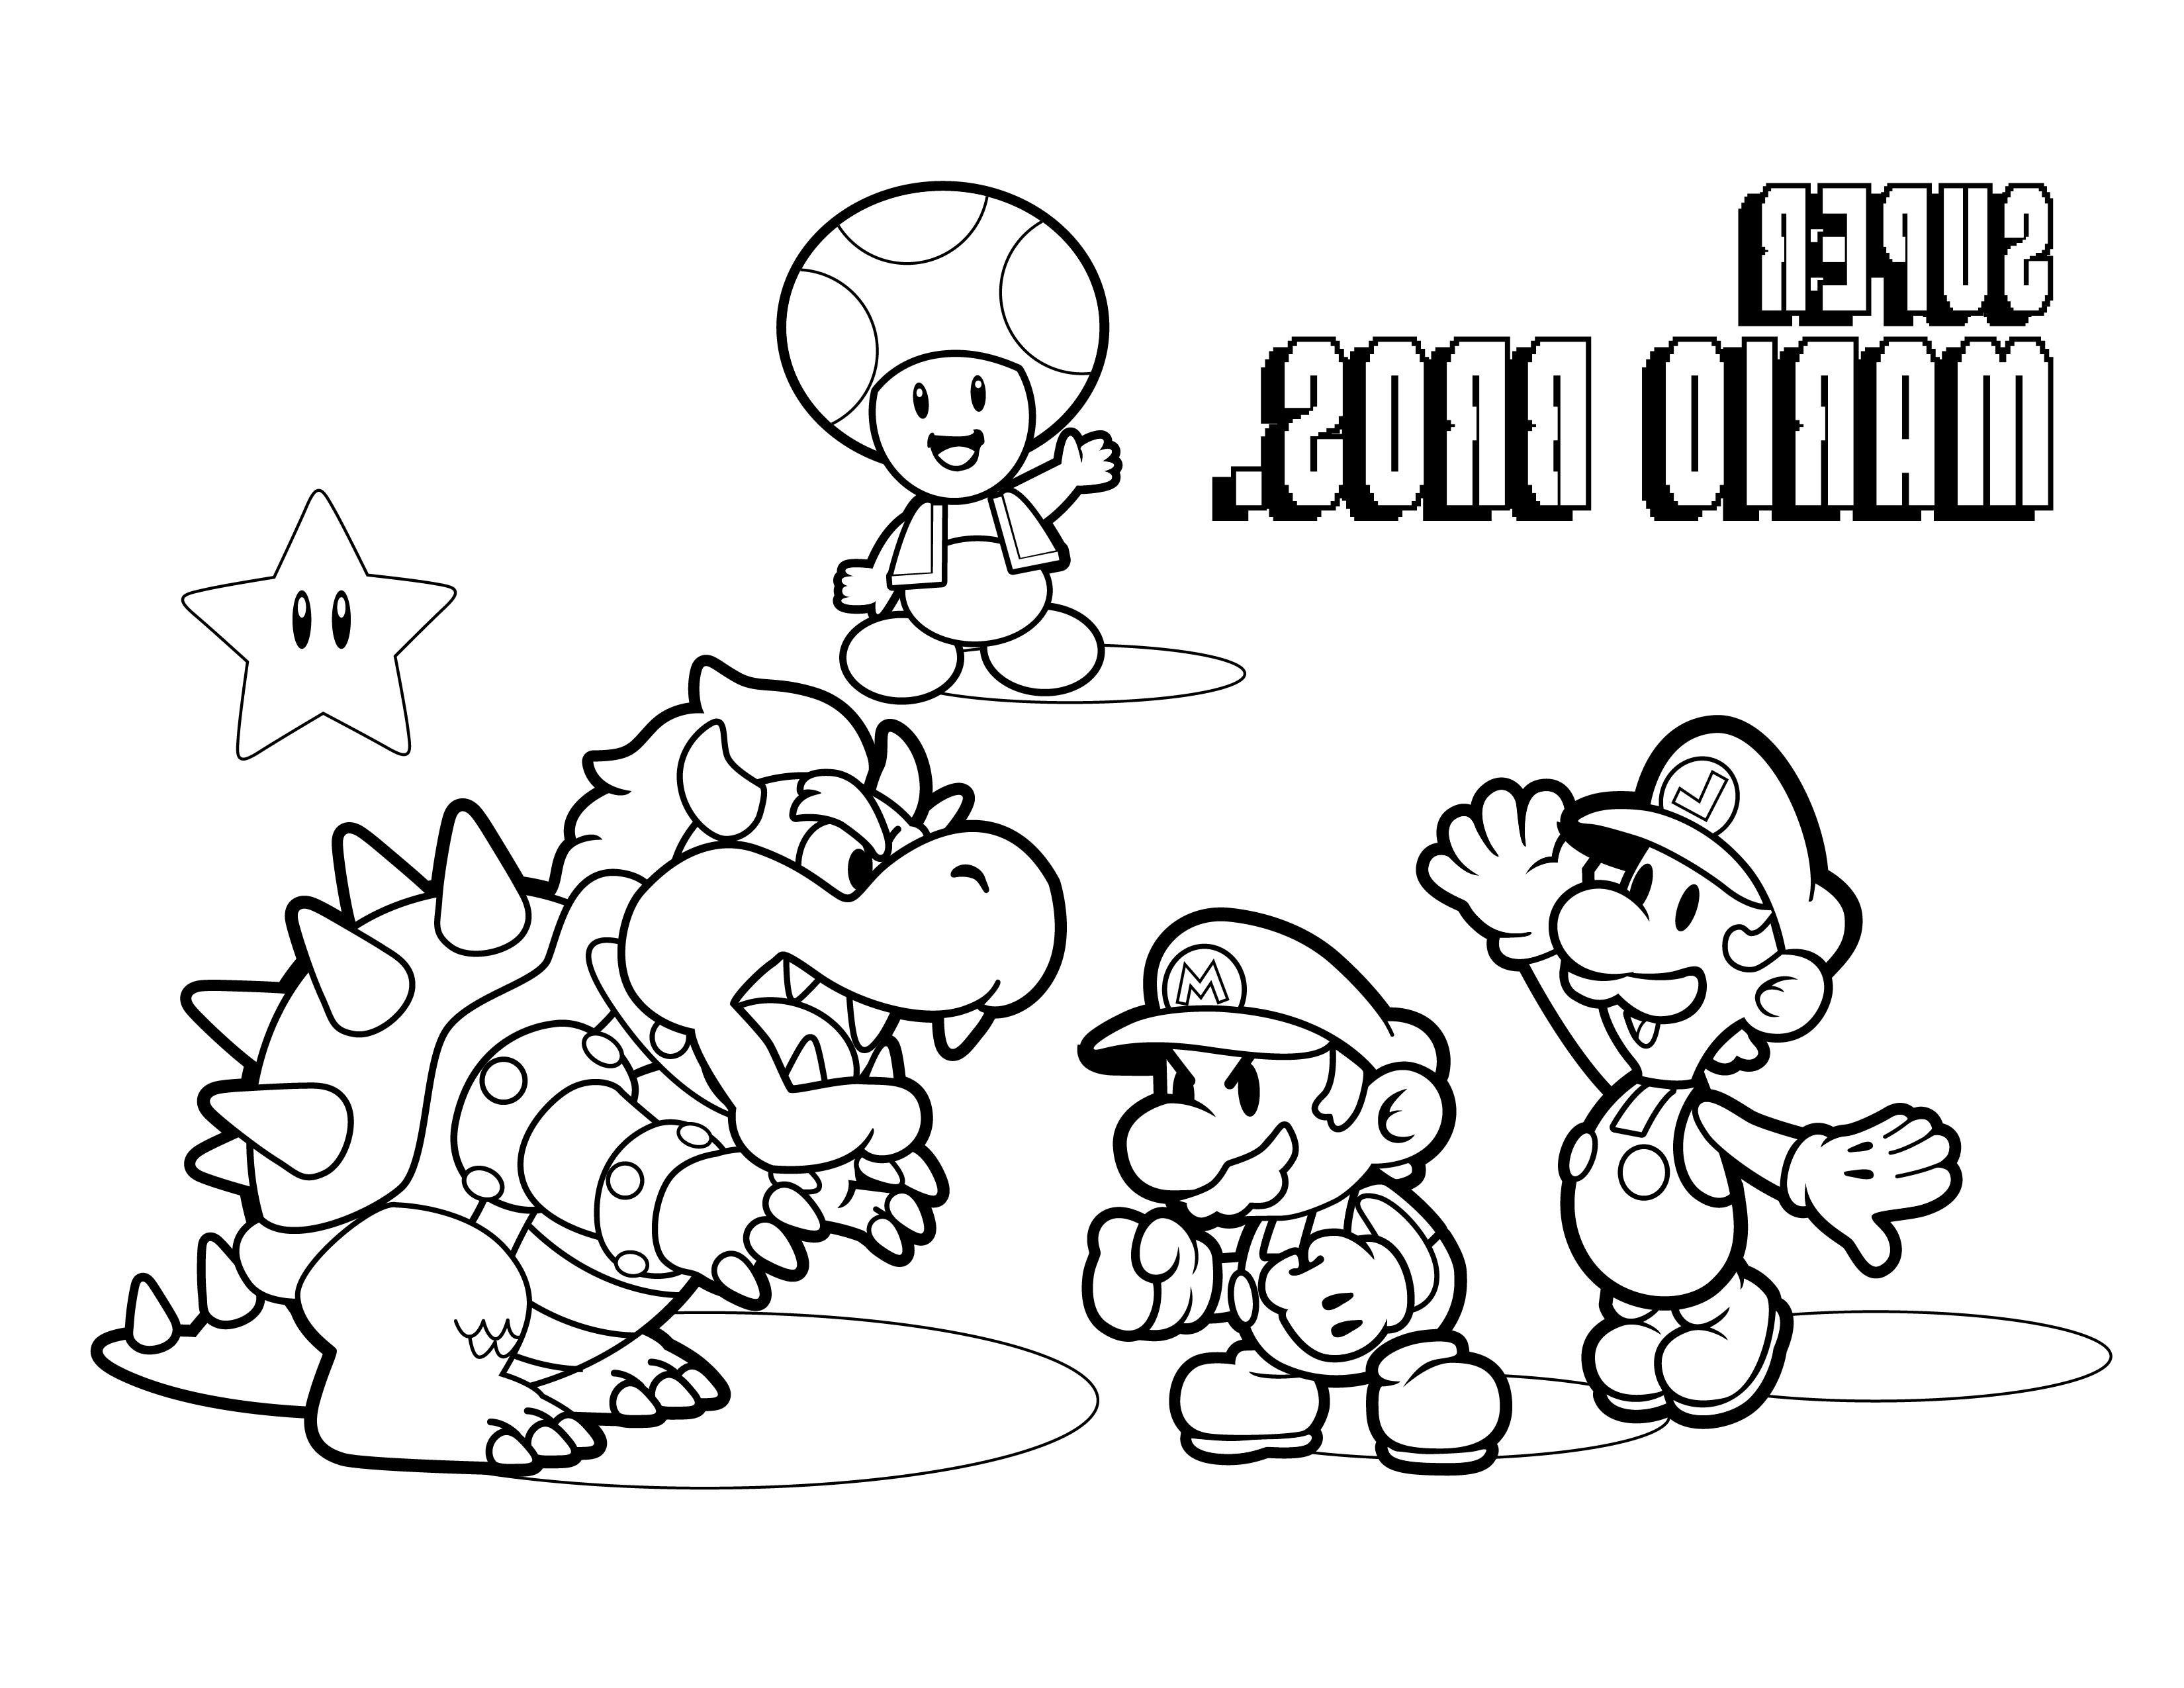 Coloriage Mario Peach Nouveau Photos Mario Bros Sur Le à Coloriage Iphone 11